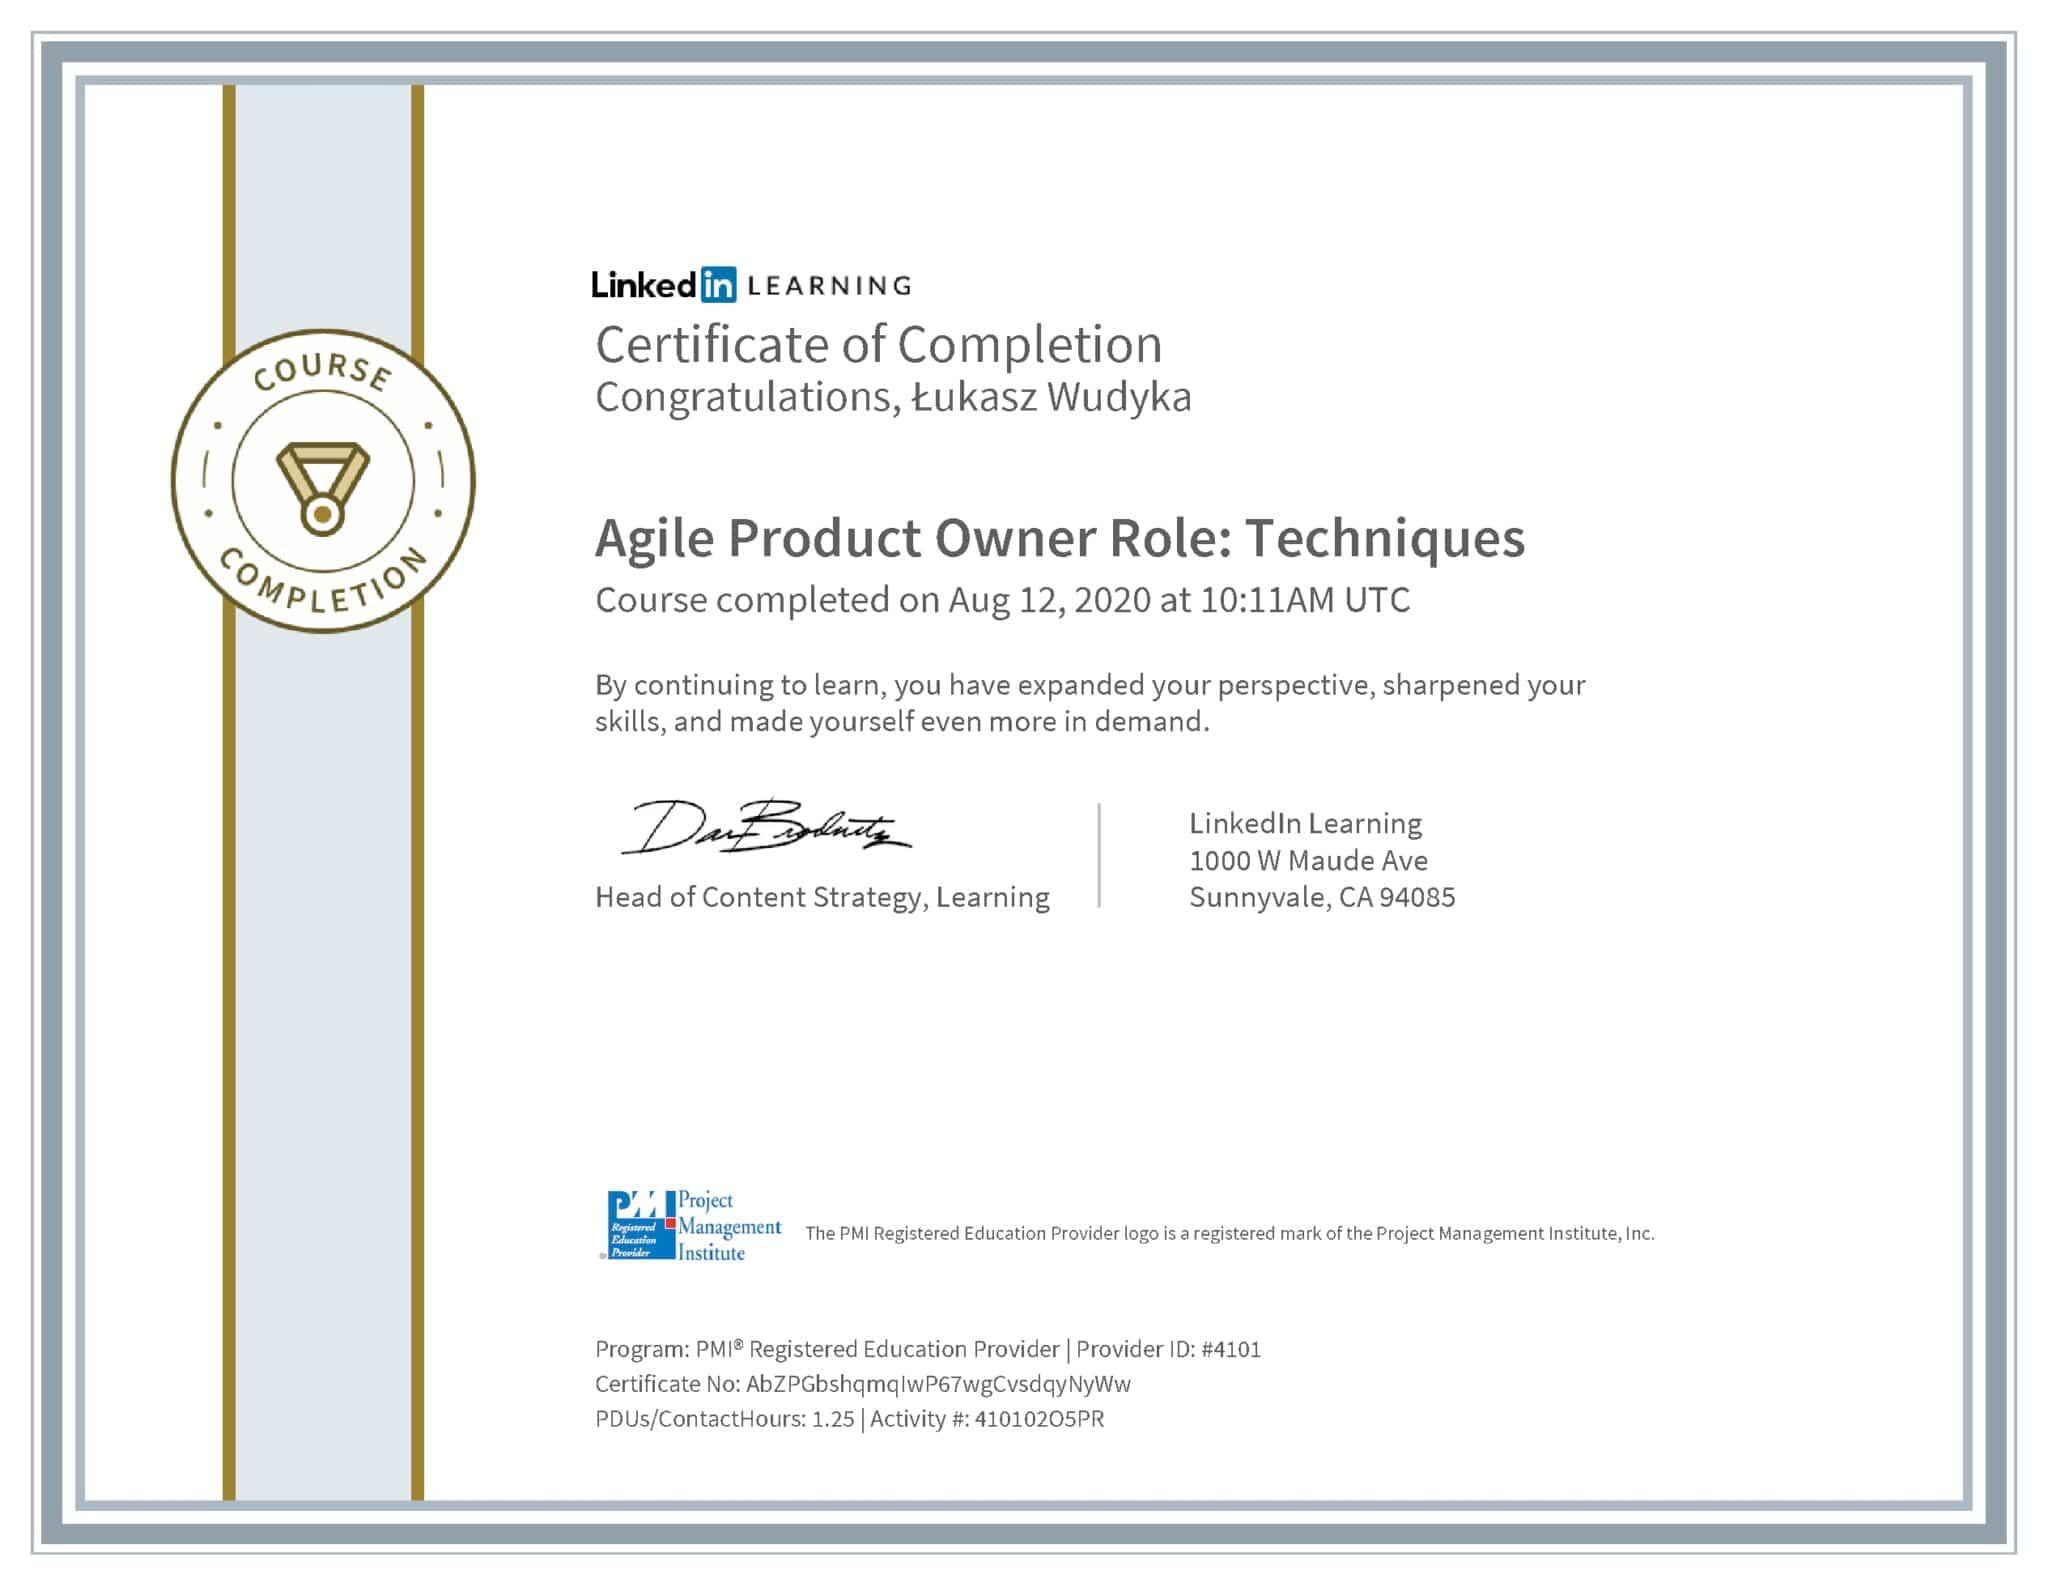 Łukasz Wudyka certyfikat LinkedIn Agile Product Owner Role: Techniques PMI